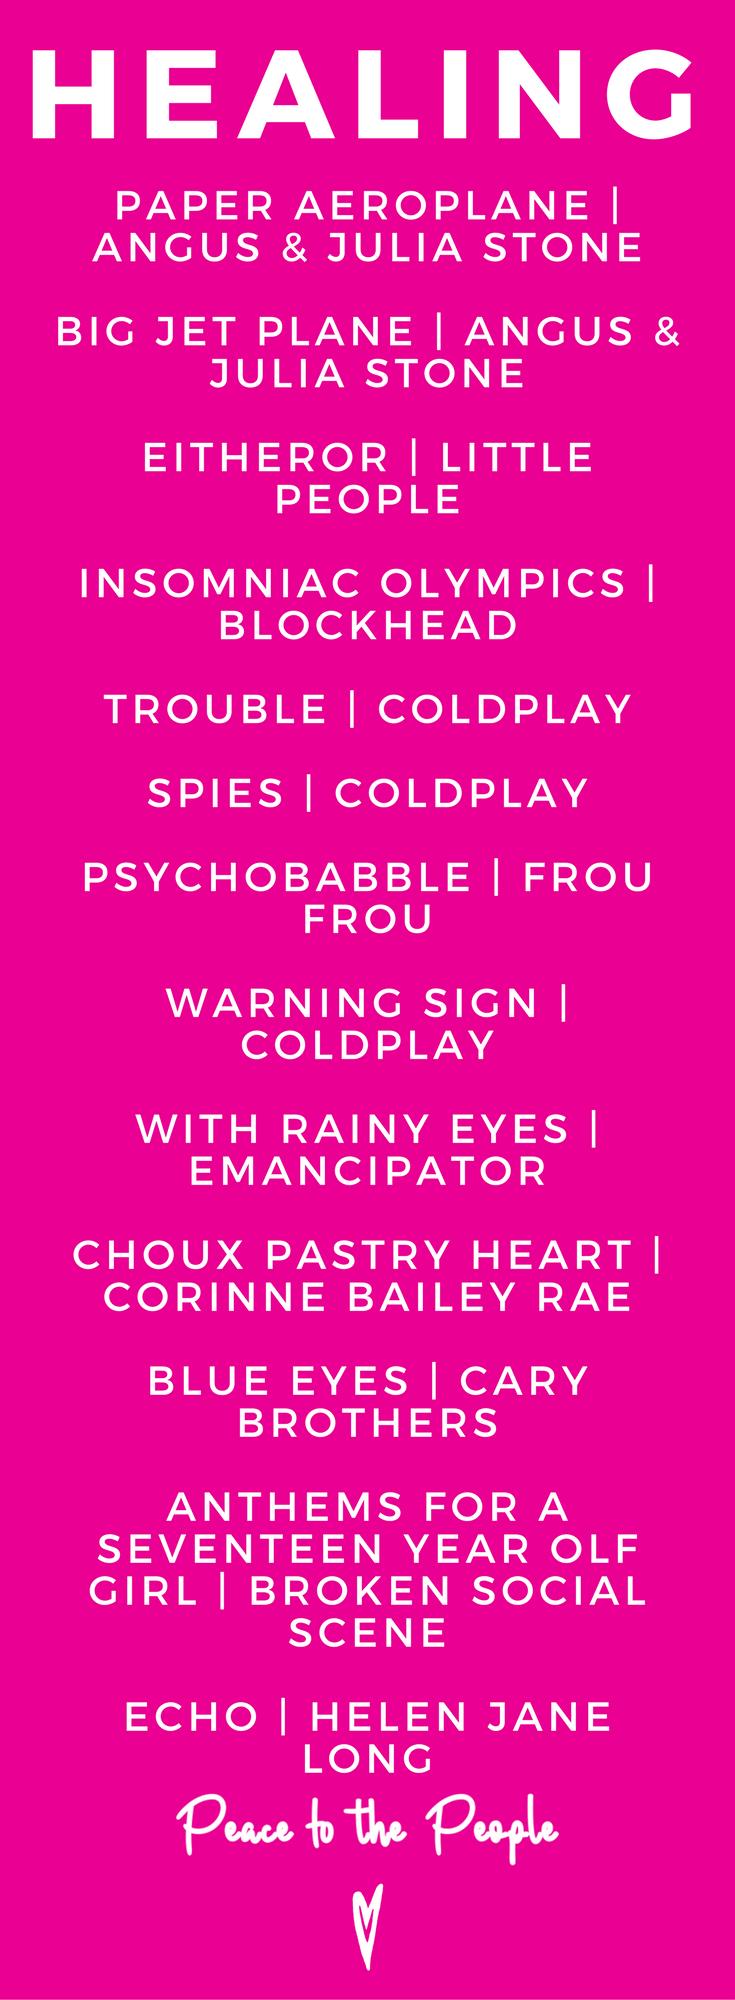 Healing Music Playlist Relaxing Calming Yoga Coldplay Broken Social Scene.png